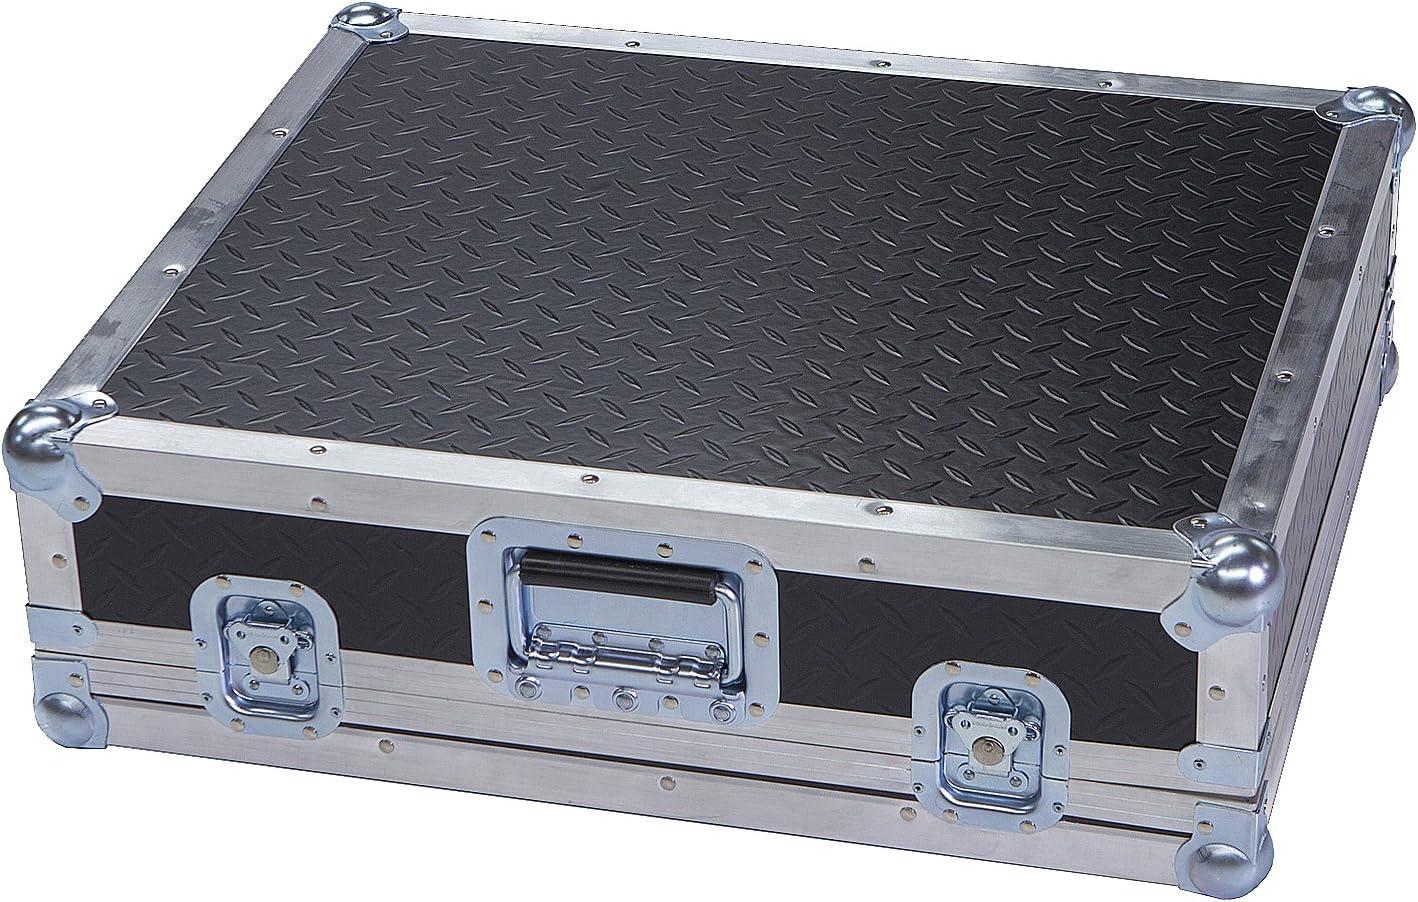 Mixers Small Units 1 4 Ply ATA Light with Case Under blast Cheap bargain sales Pl Duty Diamond